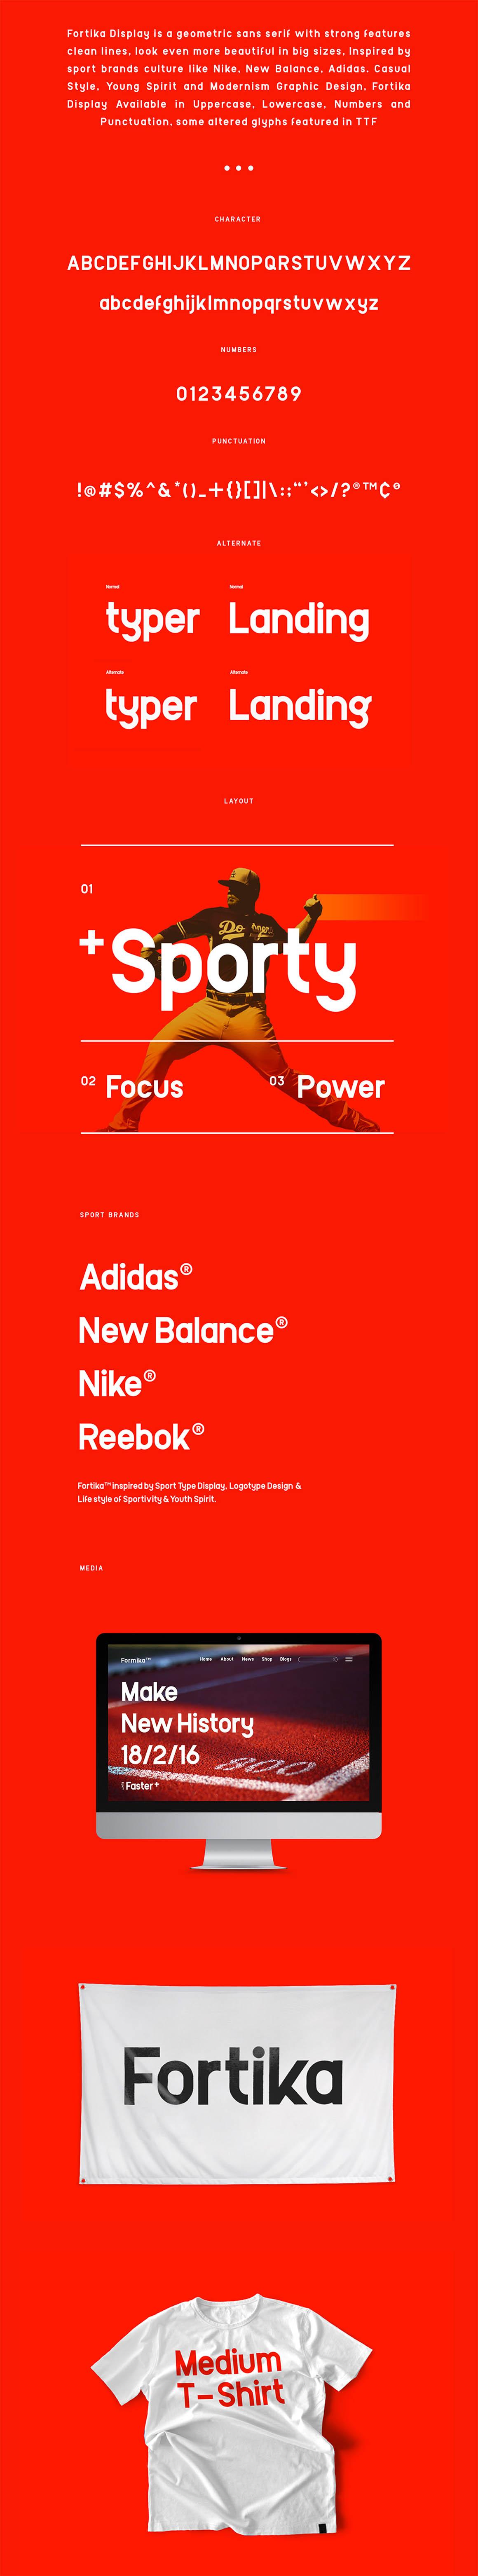 Fortika™ Display Typeface